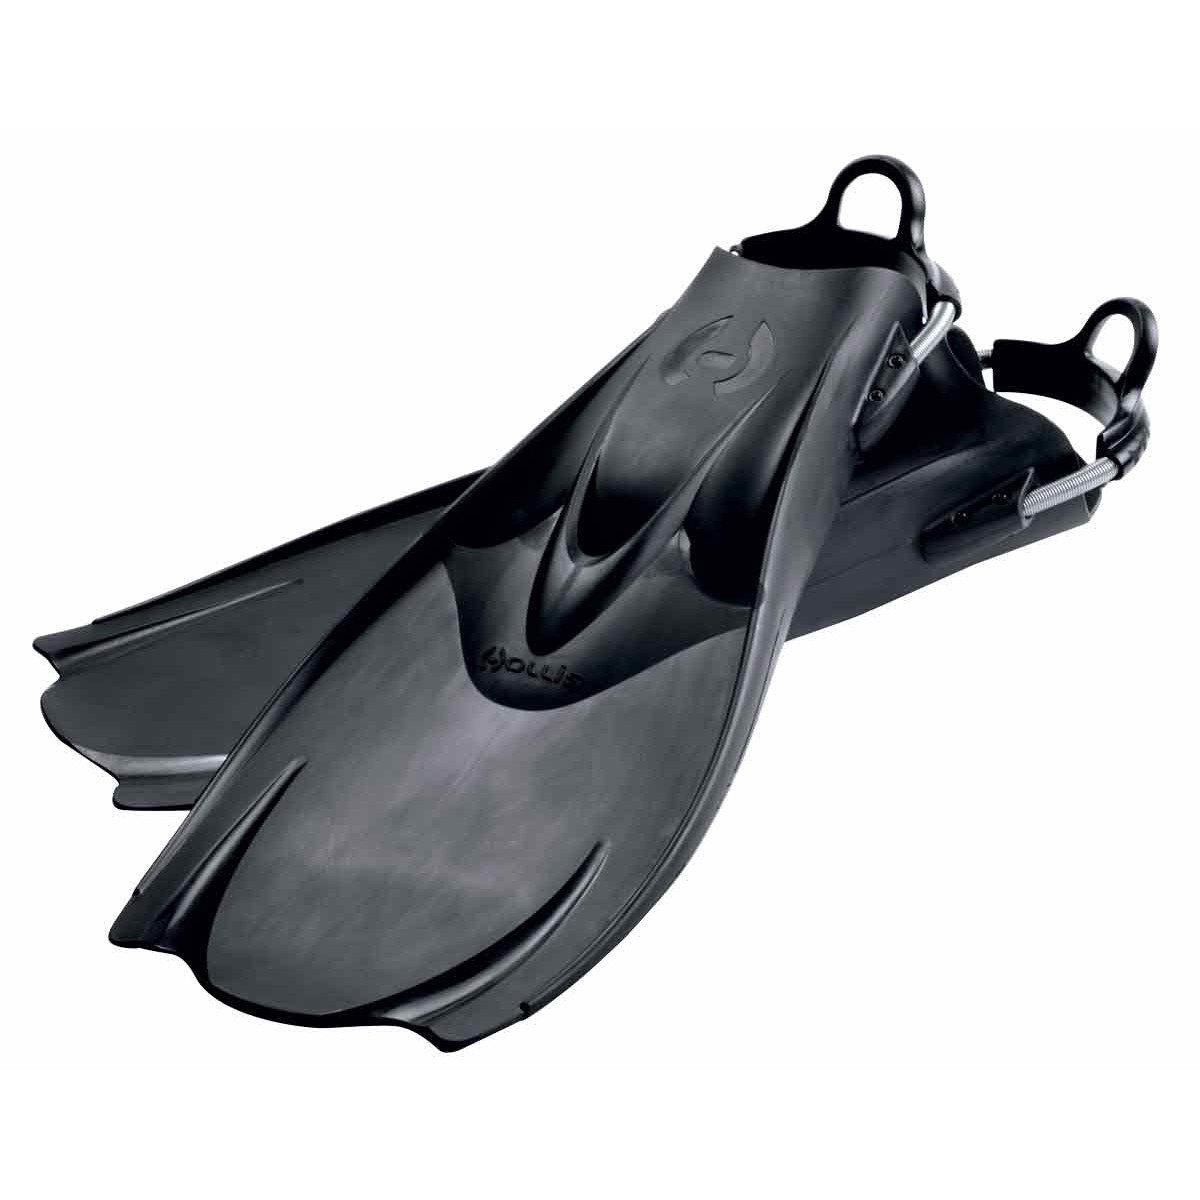 Hollis F-1 Bat Fin